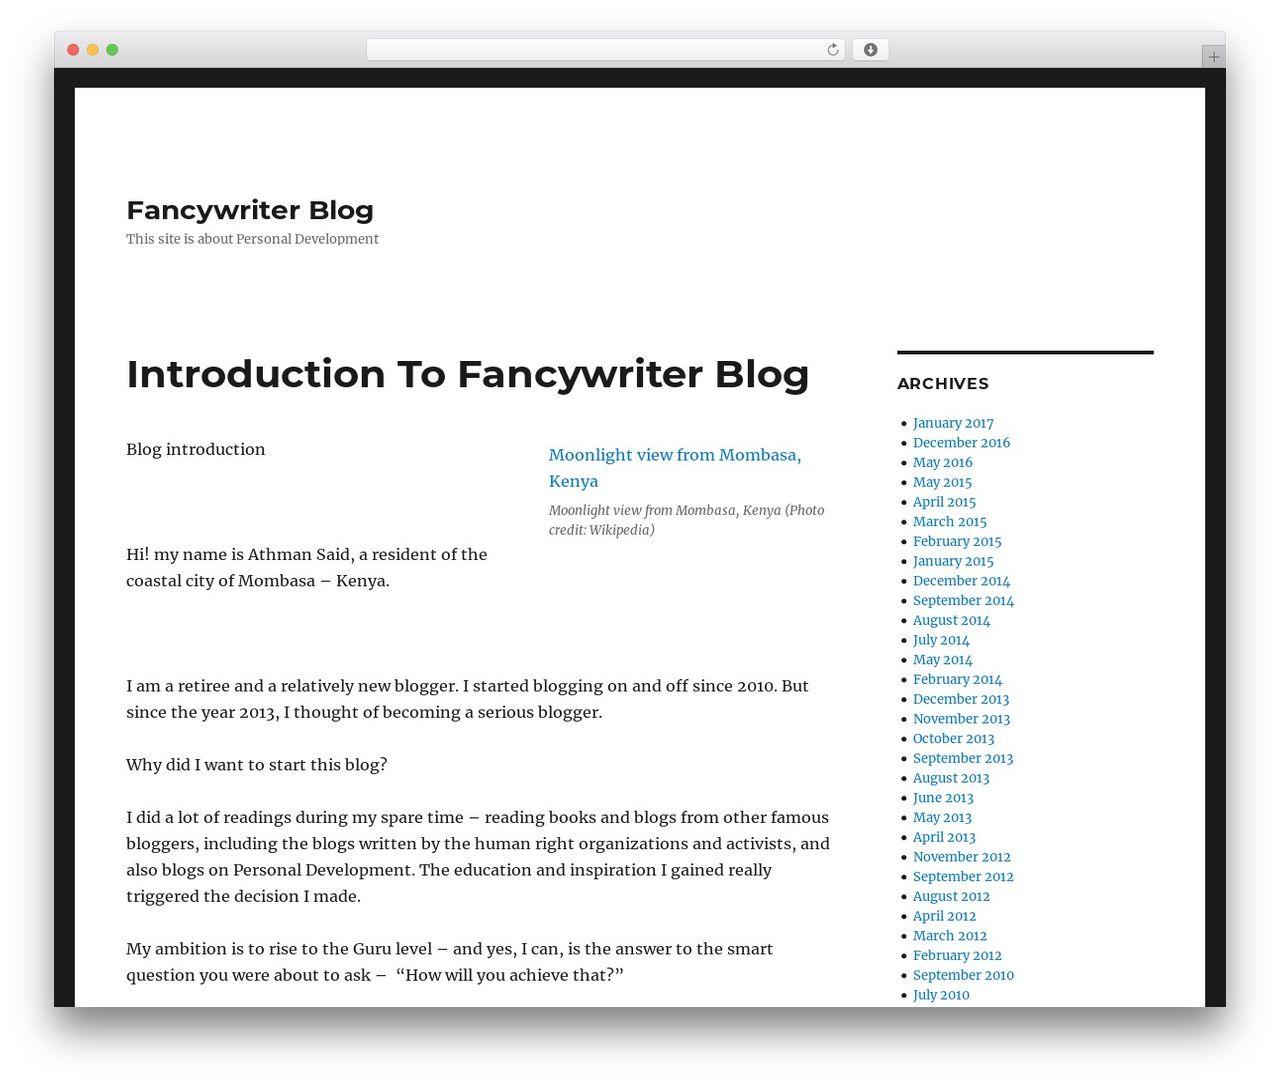 Twenty Sixteen Wordpress Template Free Download Fancywriter Com In 2020 Wordpress Template Free Wordpress Templates Templates Free Download